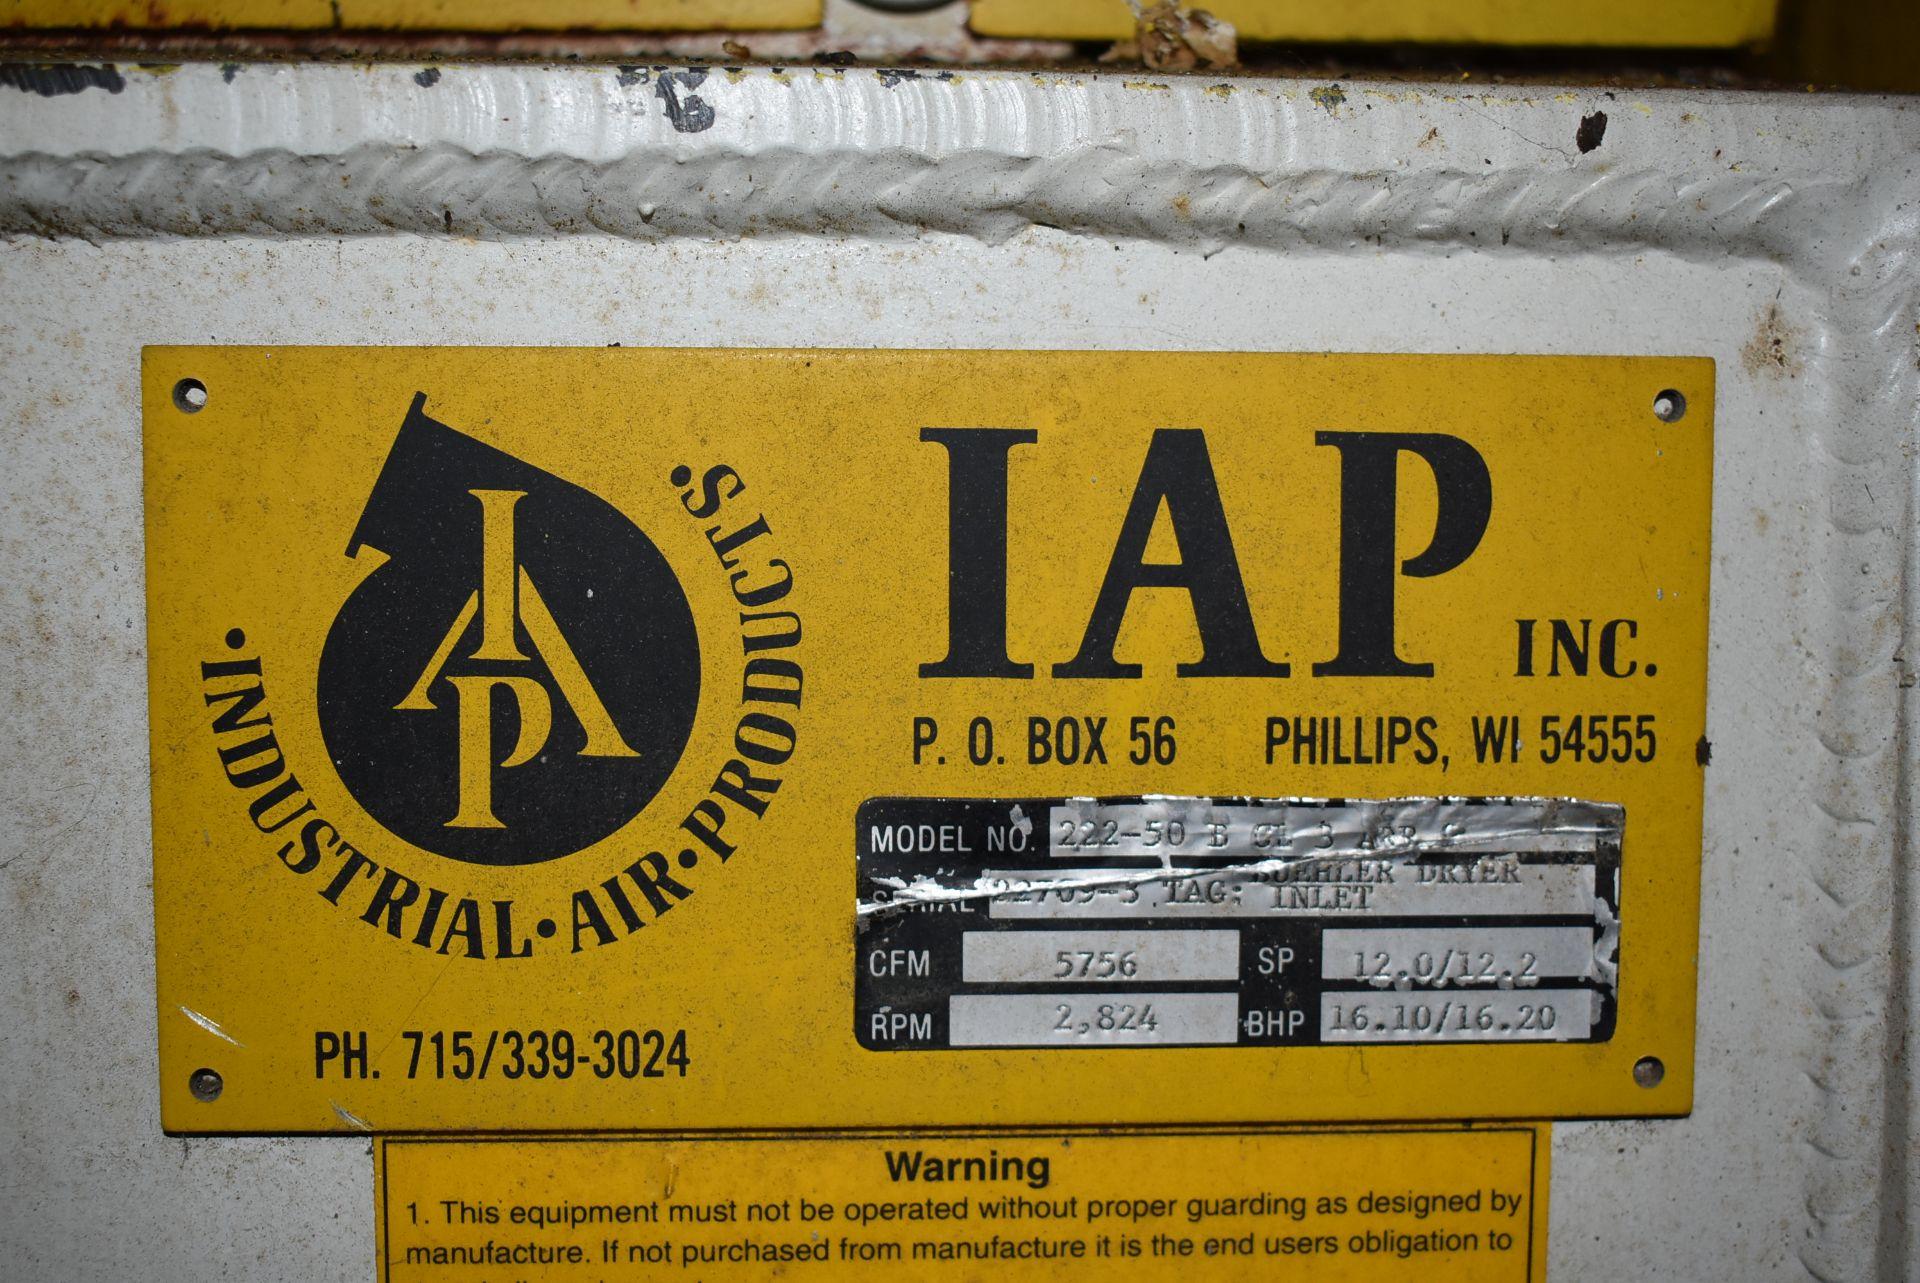 IAP Inc. Model #222-50-D Blower w/Marathon 20 HP Motor - Image 2 of 3